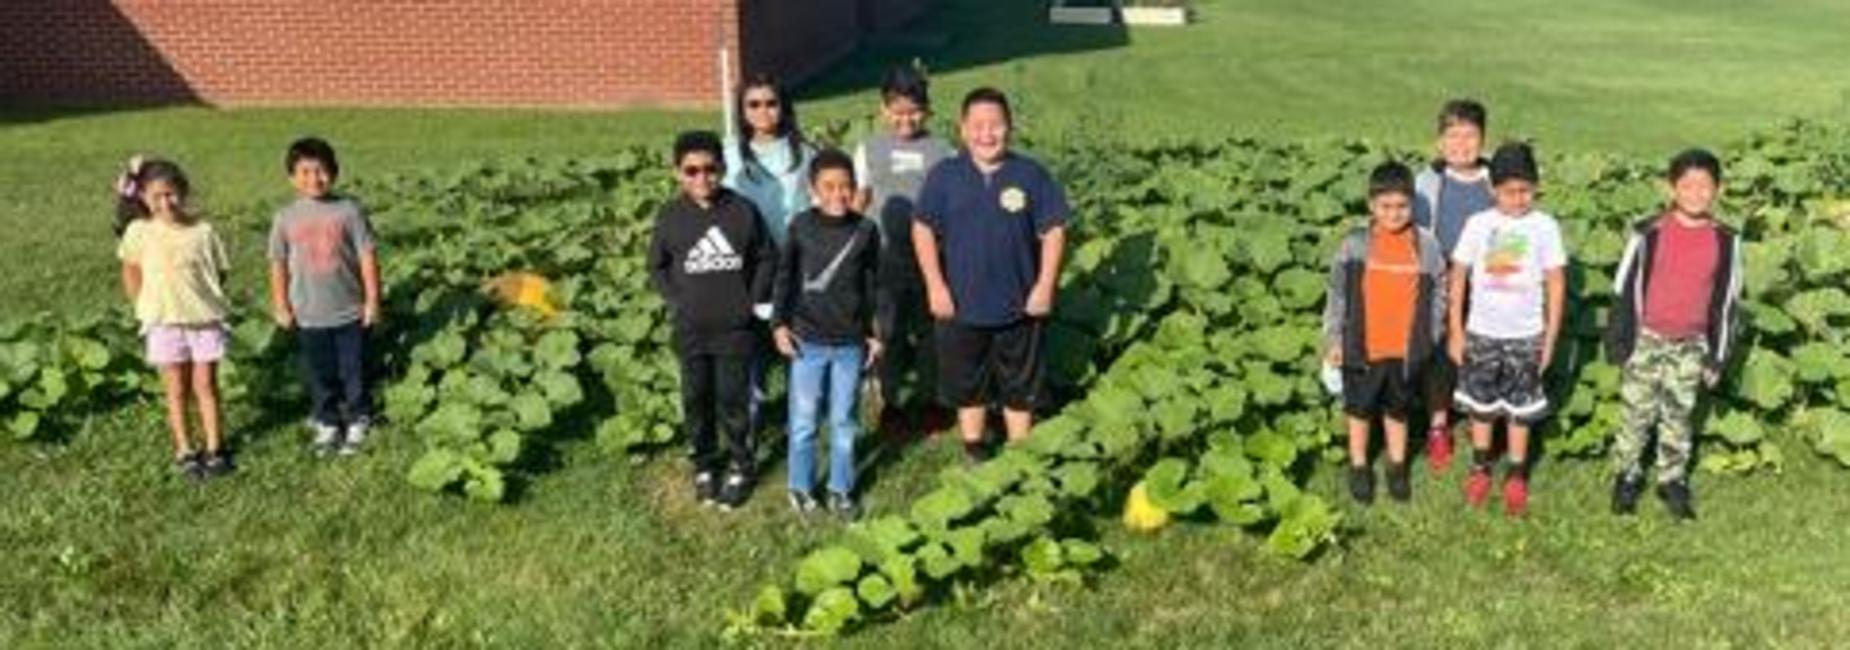 Atkins Elementary School English Learners Pumpkin Patch